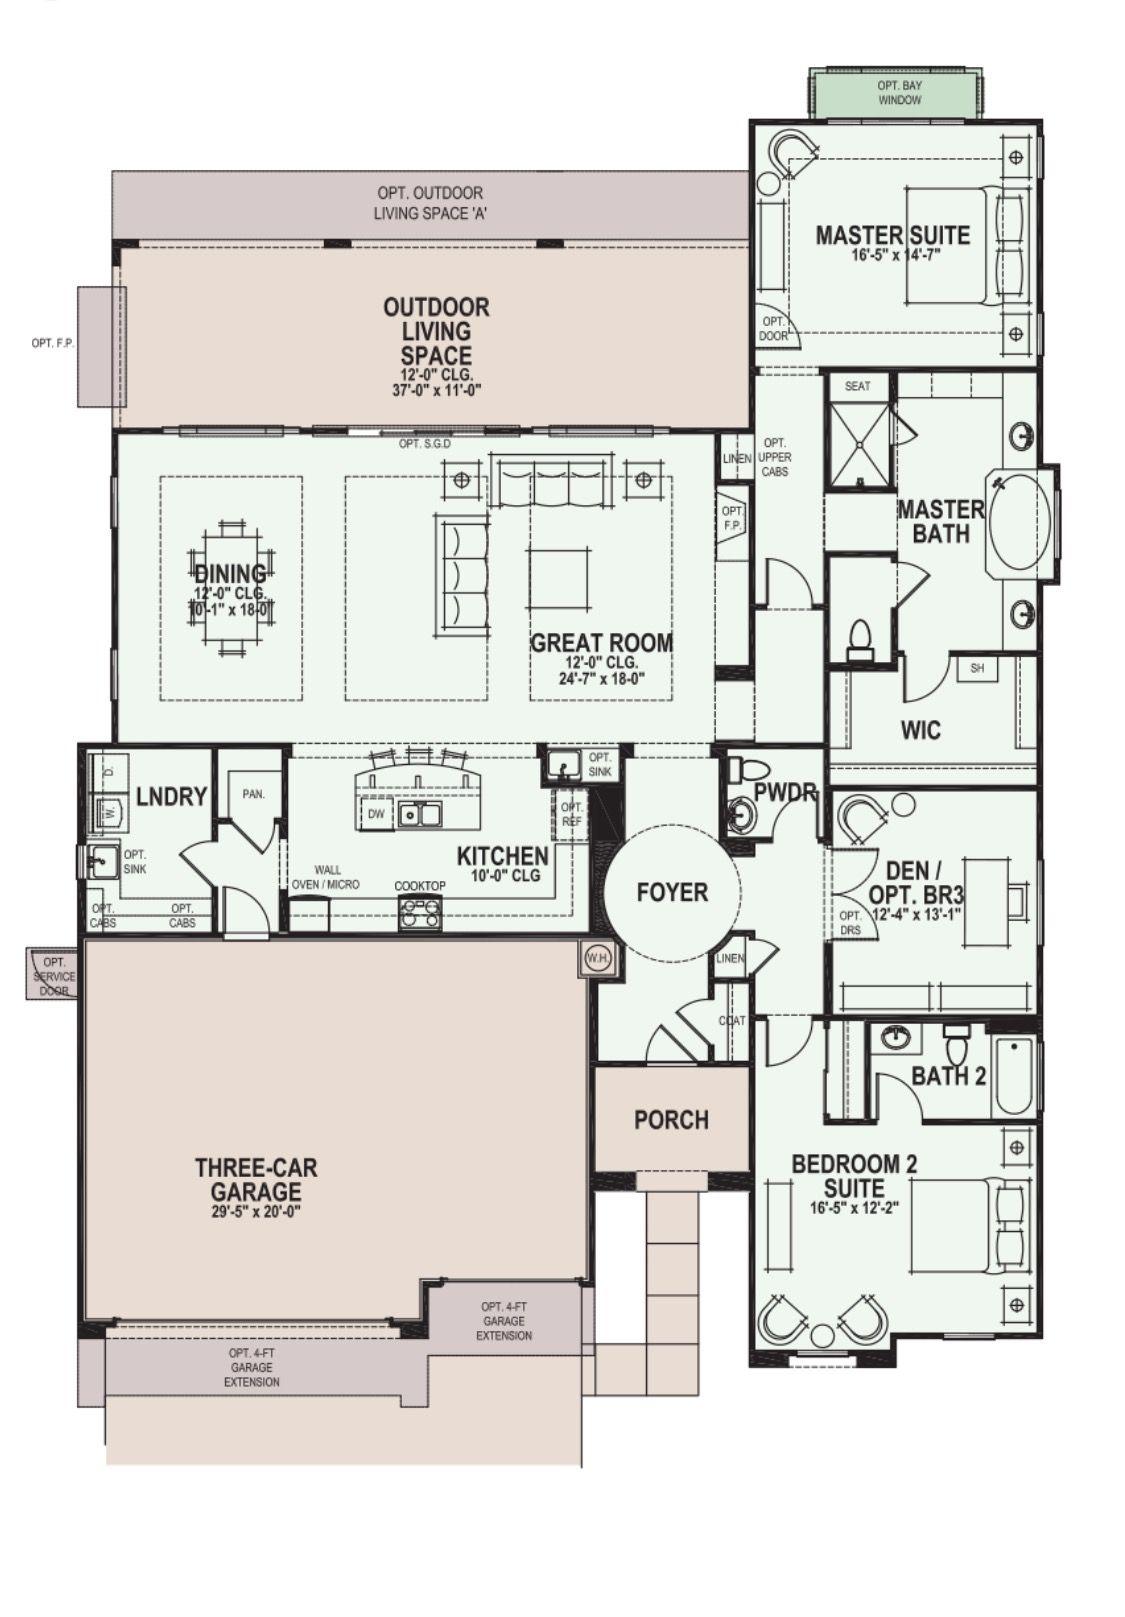 69+ Robson Ranch Floor Plans - Robson Ranch Texas Premiere Ashland ...